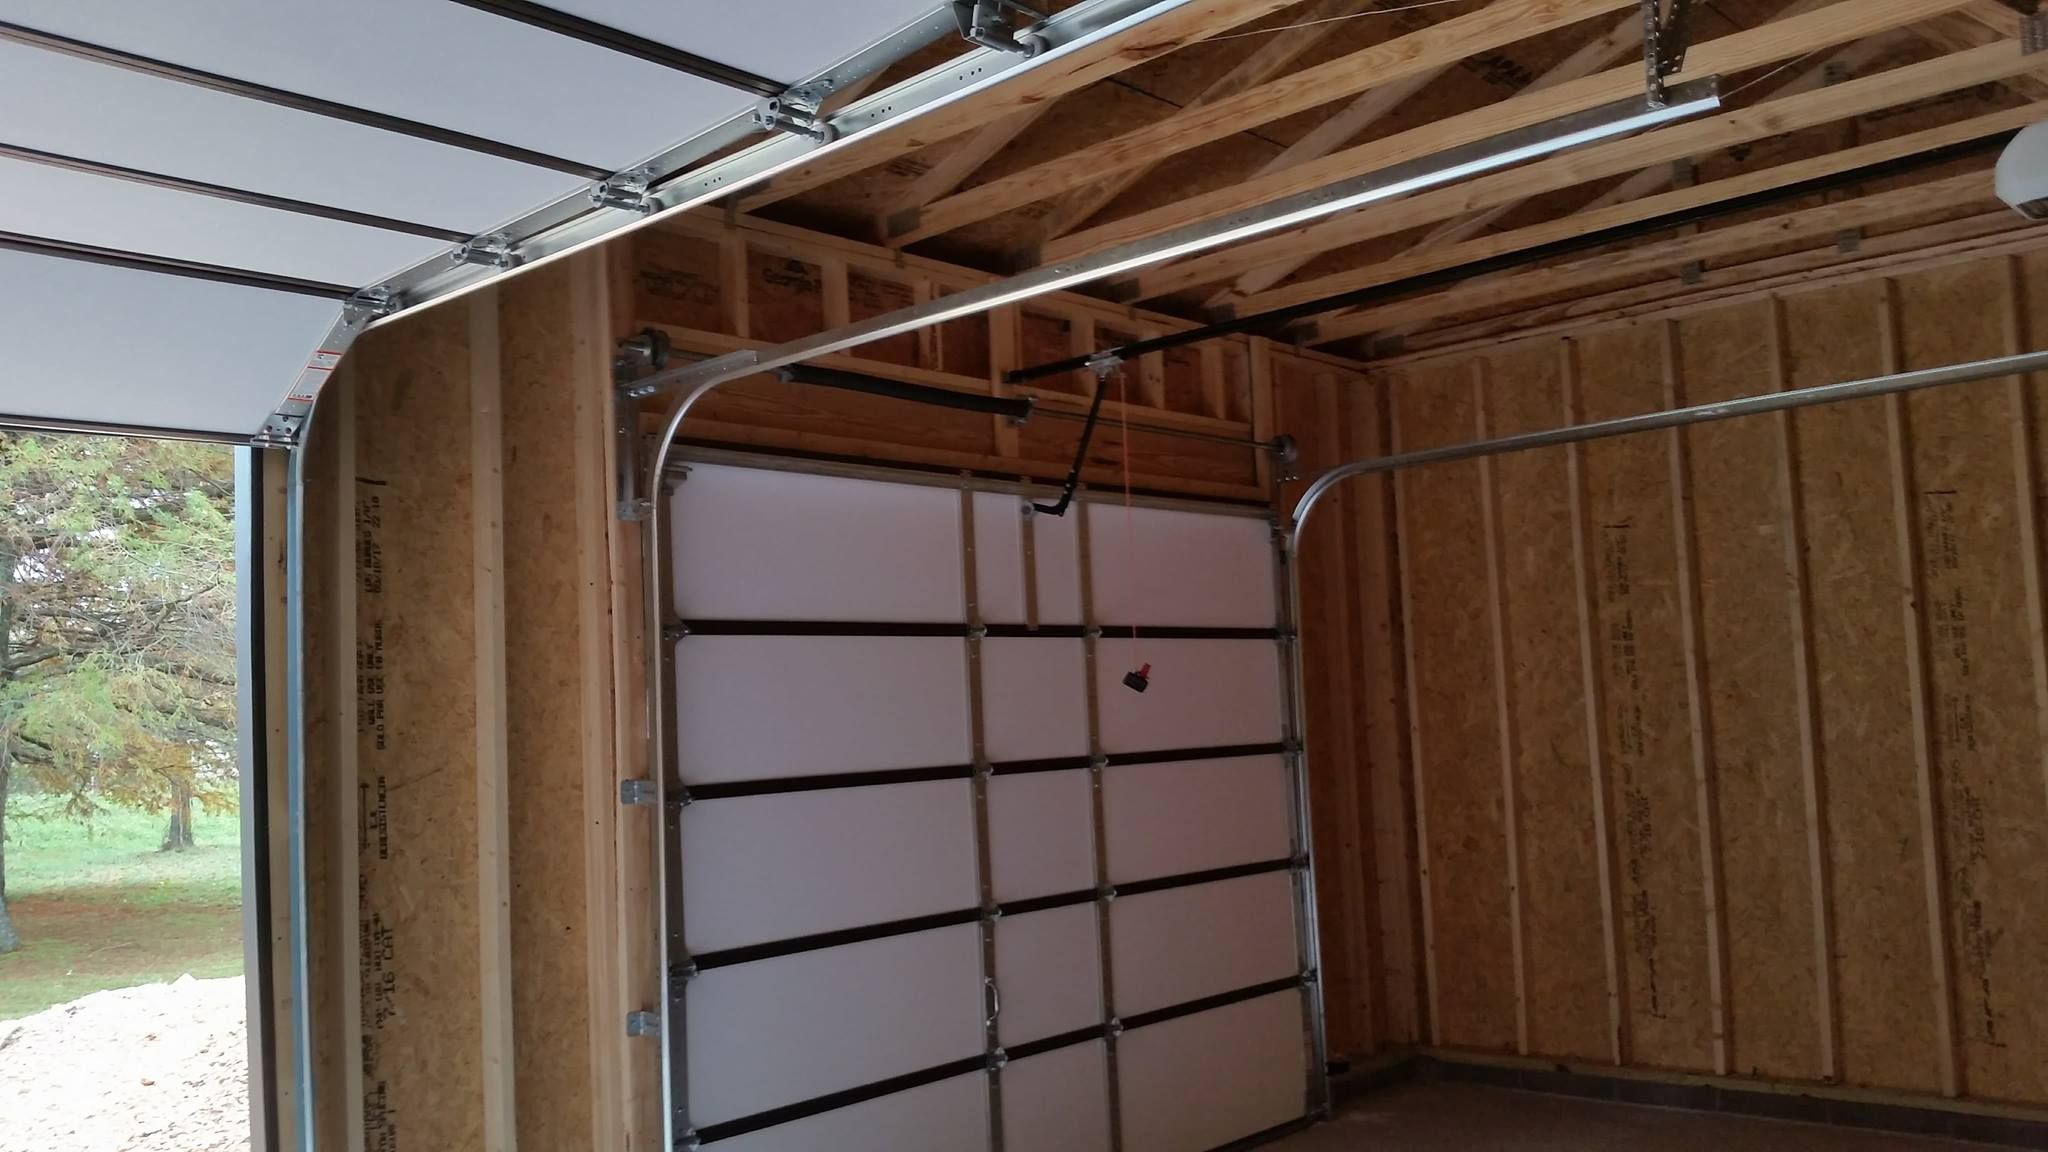 garage for amazing opener on commercial cal inc automatic doors nor repair regarding openers sale chamberlain throughout overhead incredible door exterior up roll